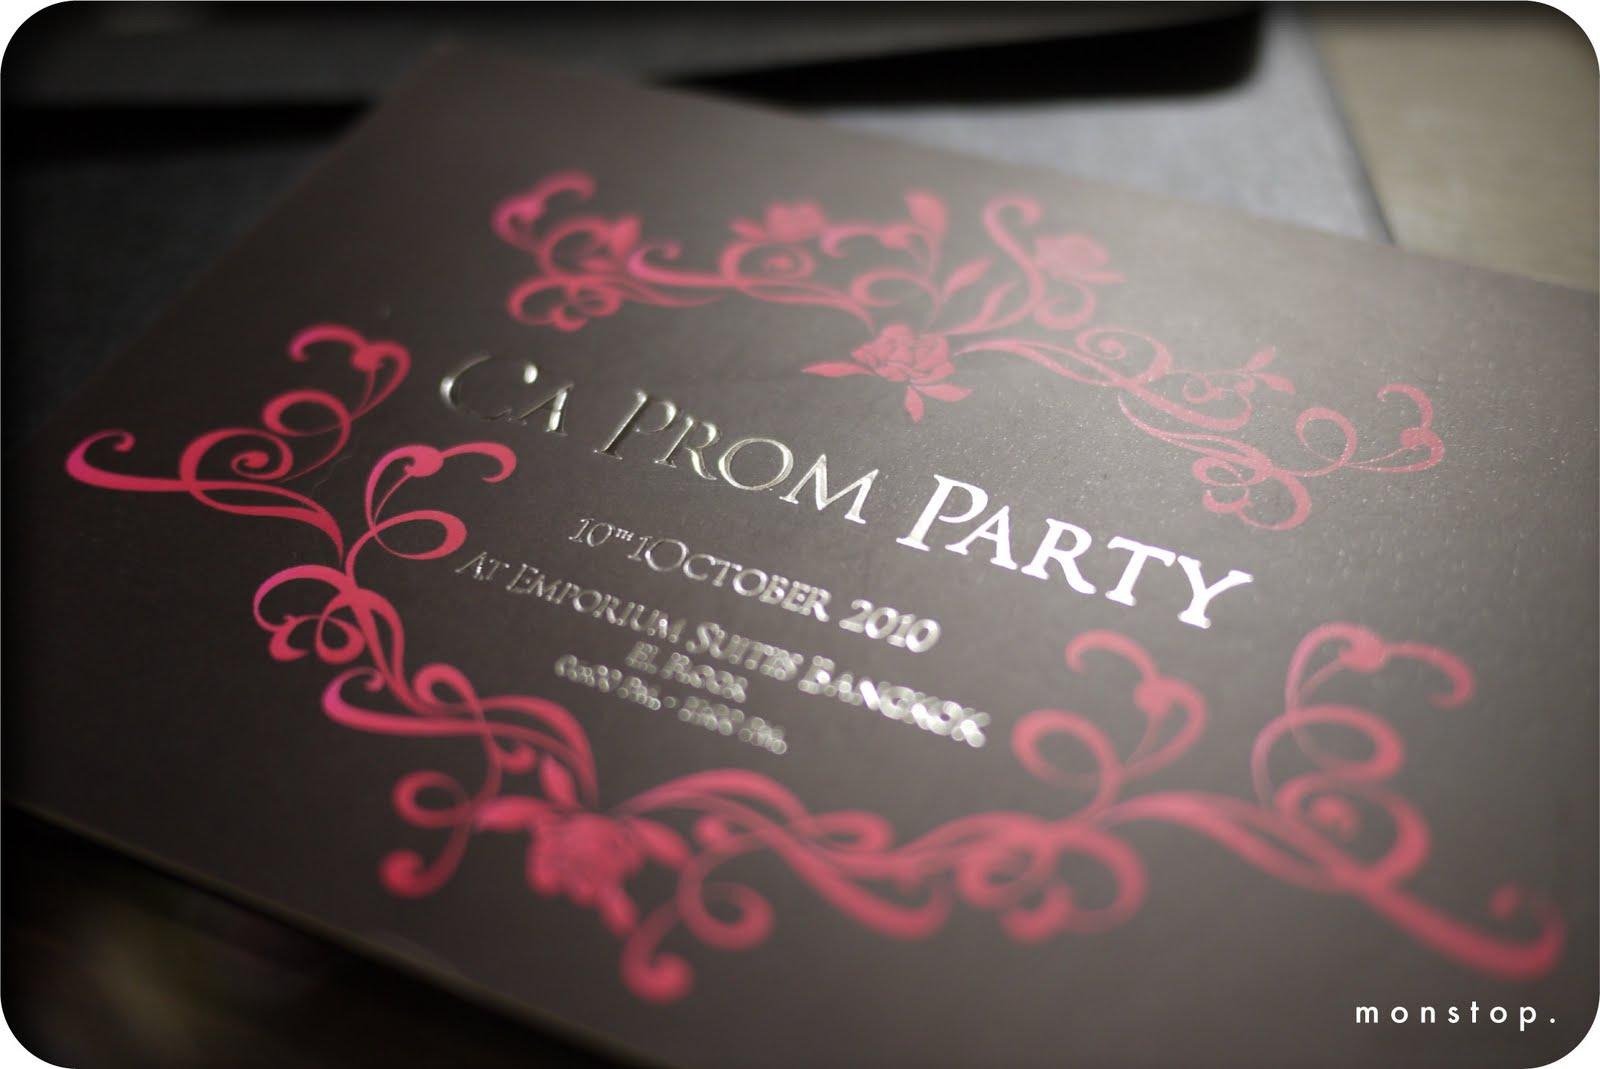 m o n s t o p invitation card   ca prom party